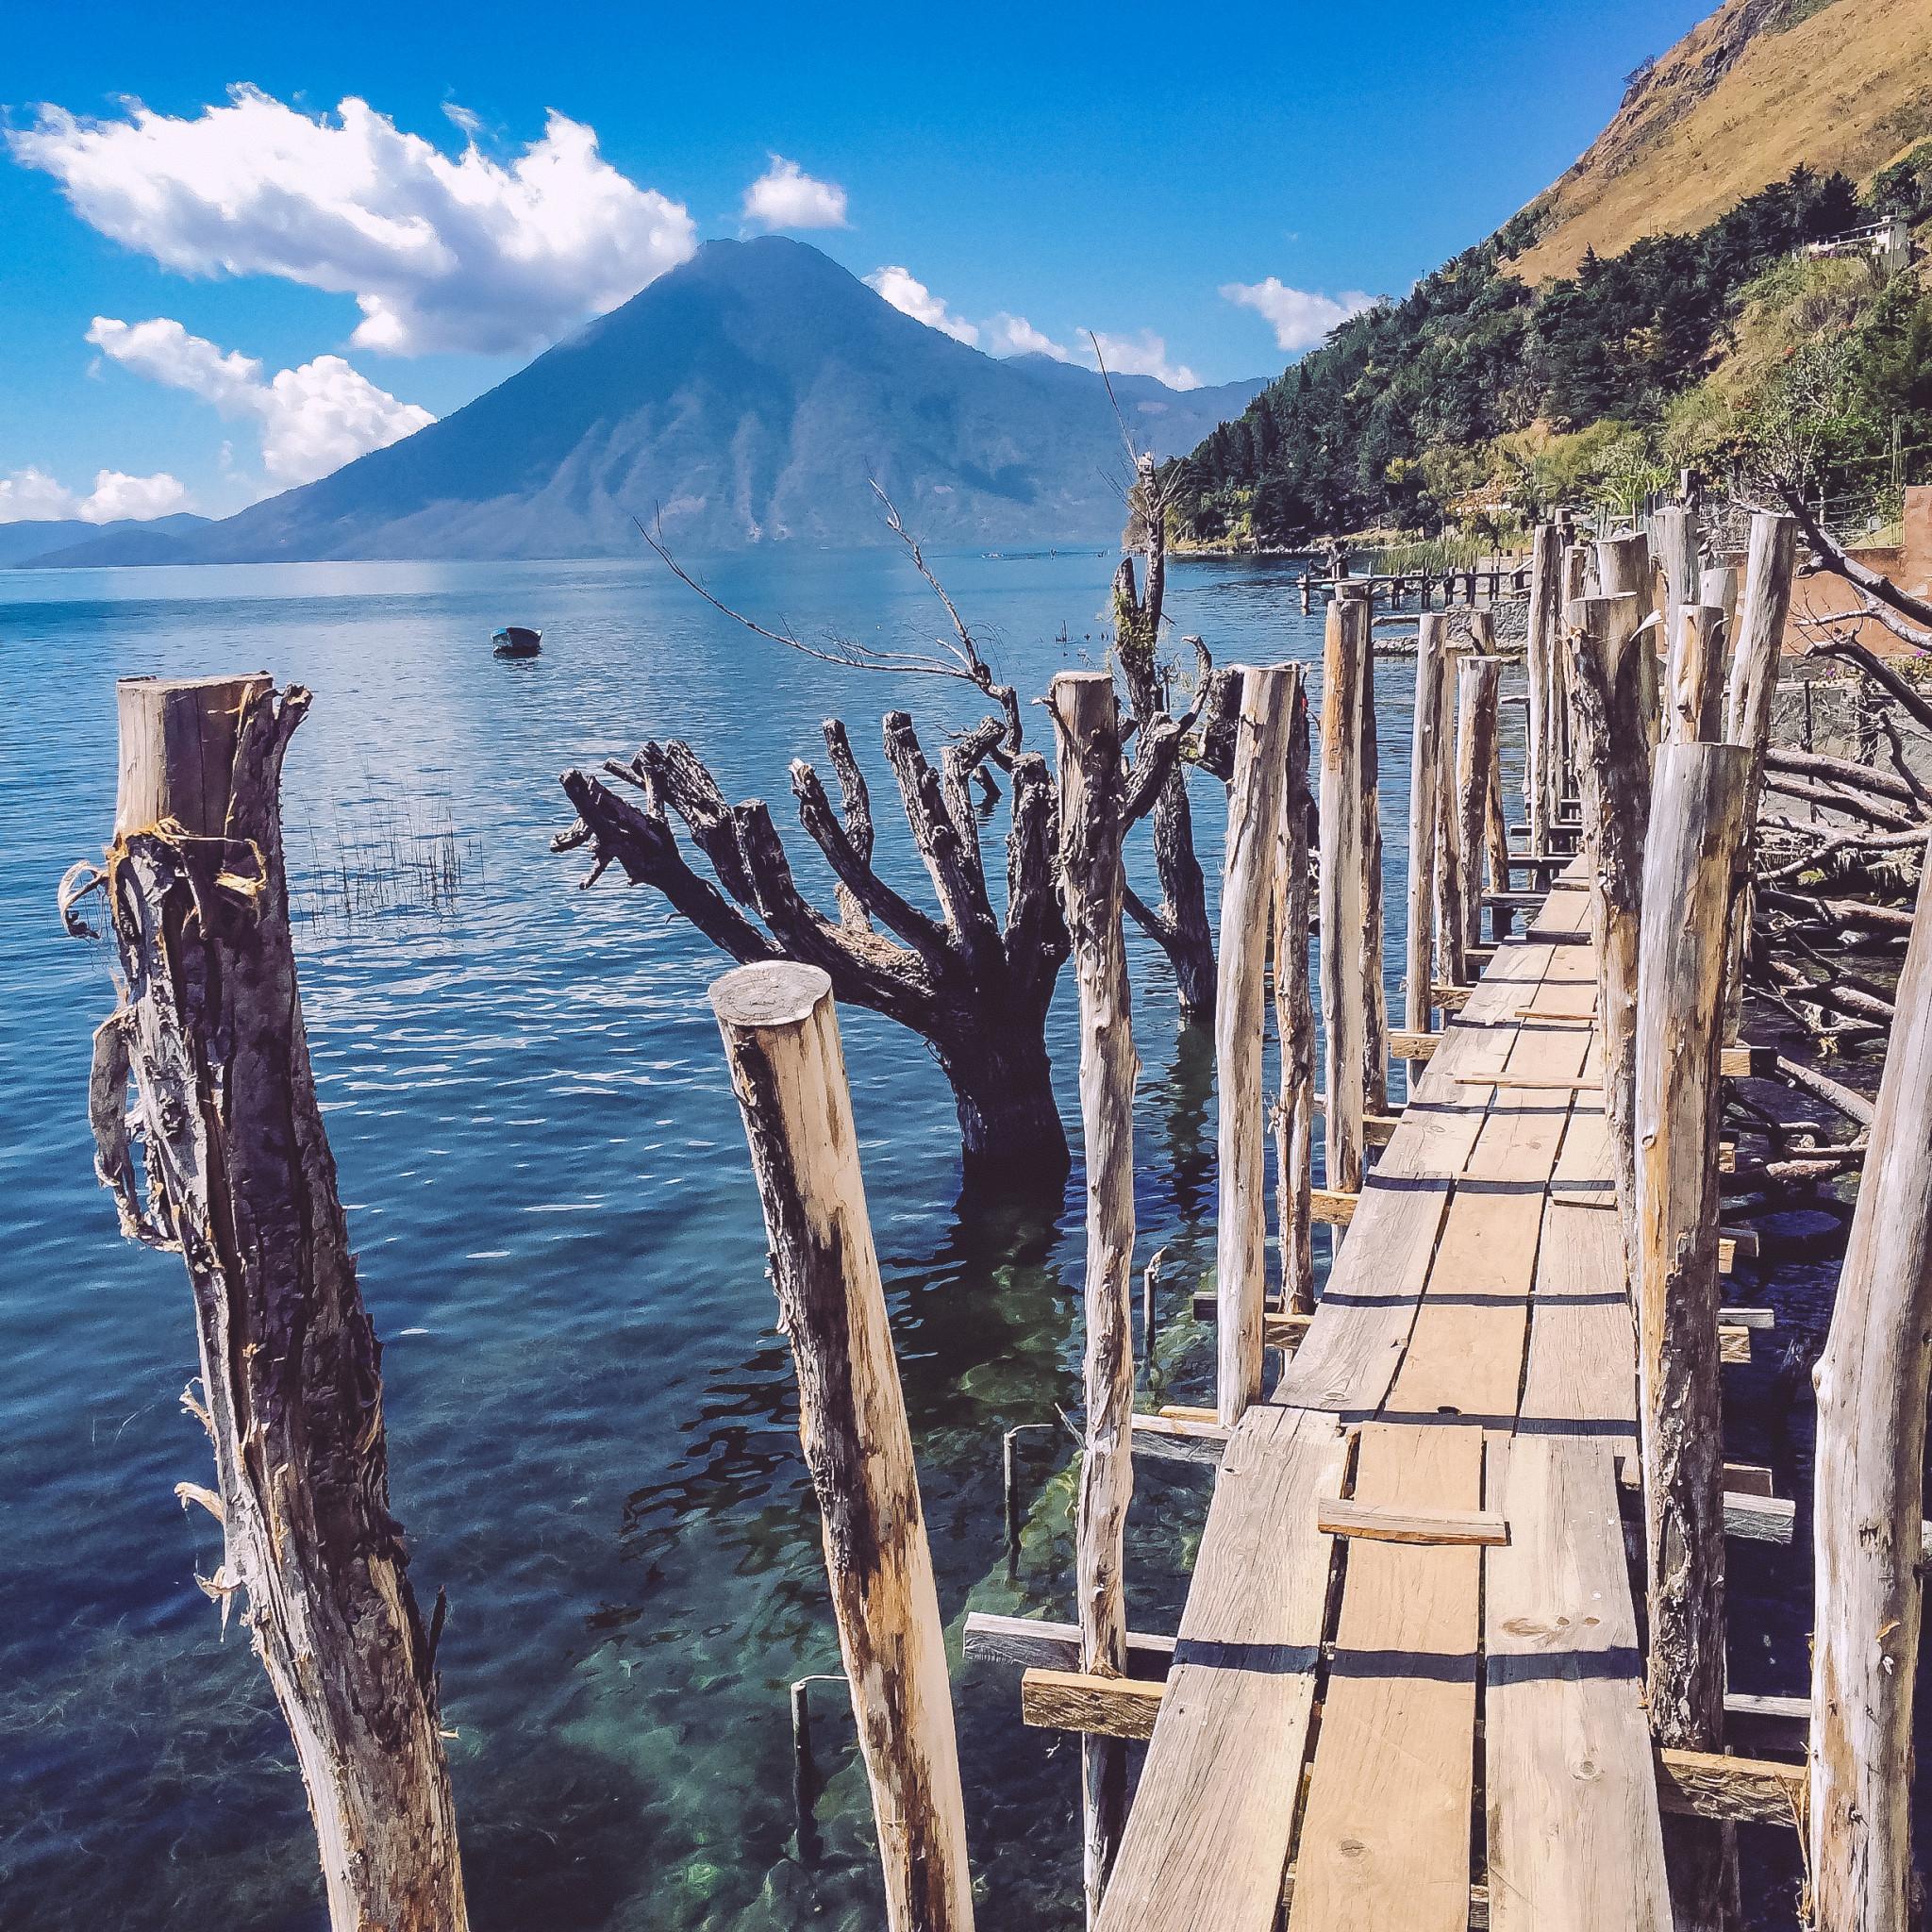 Flüge: Guatemala [April - Juni] - Hin- Rückflug mit Air France und KLM von Luxemburg nach Guatemala City ab nur 352€ inkl. Gepäck